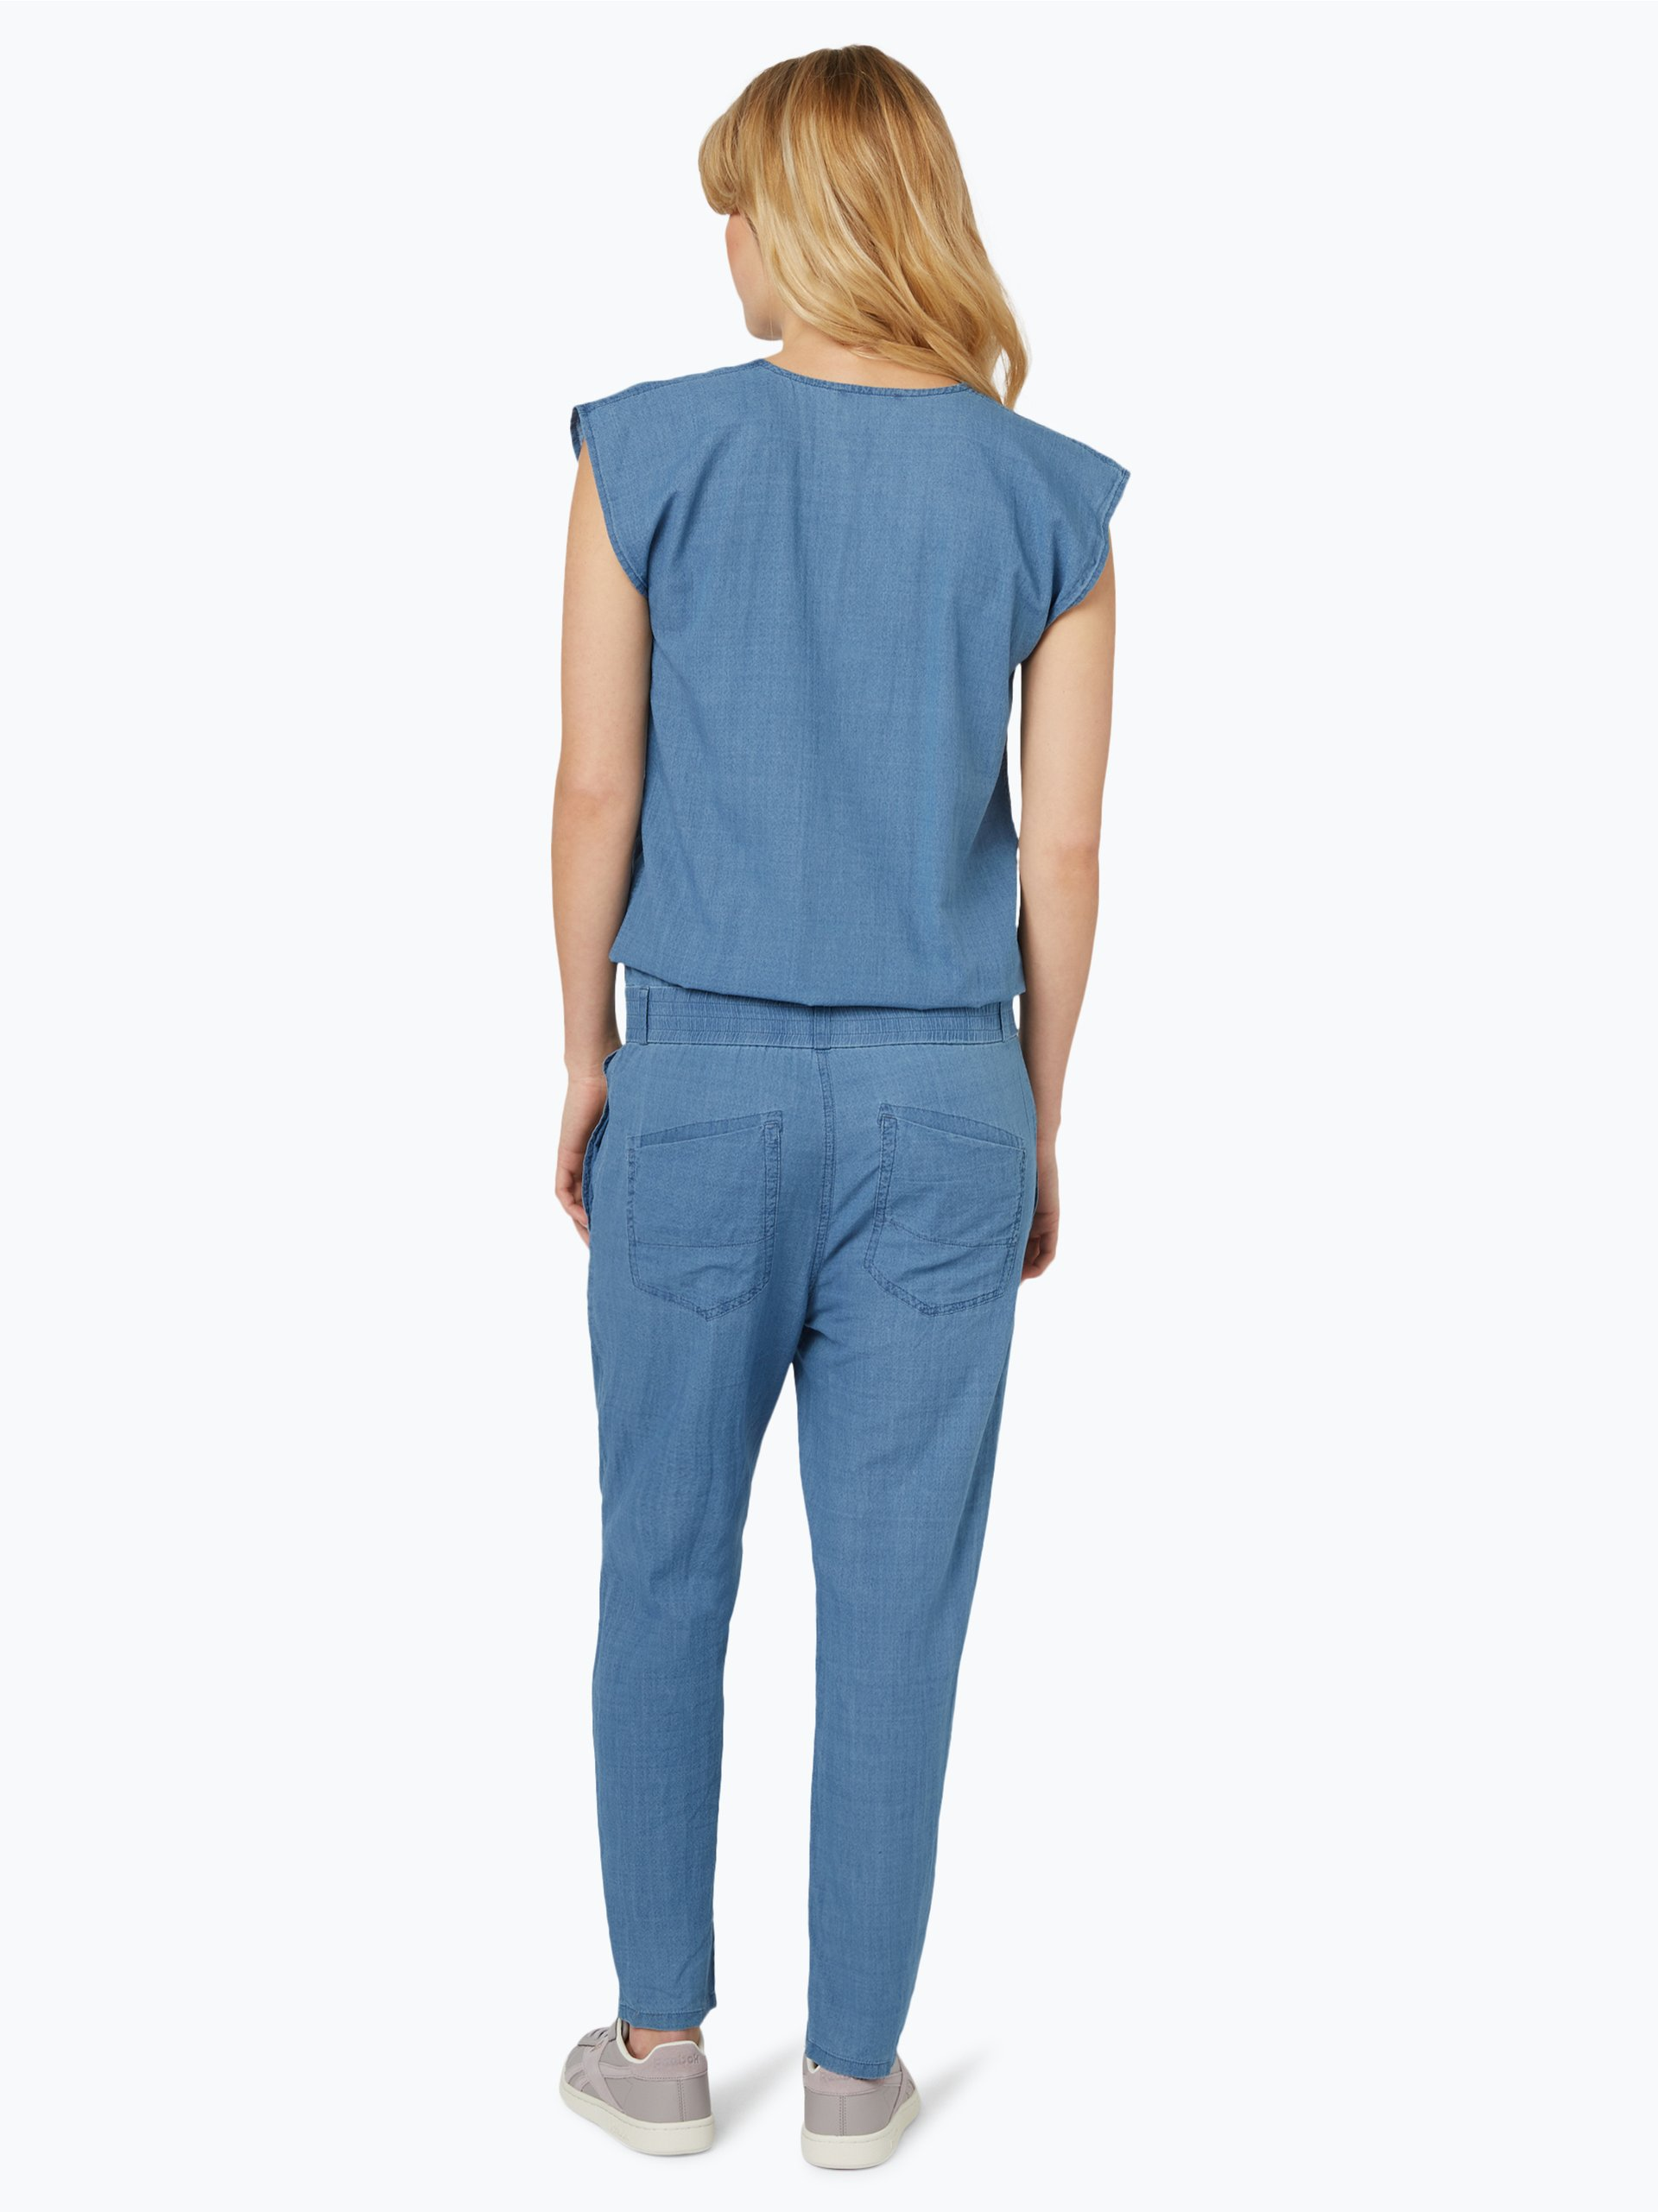 drykorn damen jeans jumpsuit tova blau uni online kaufen. Black Bedroom Furniture Sets. Home Design Ideas